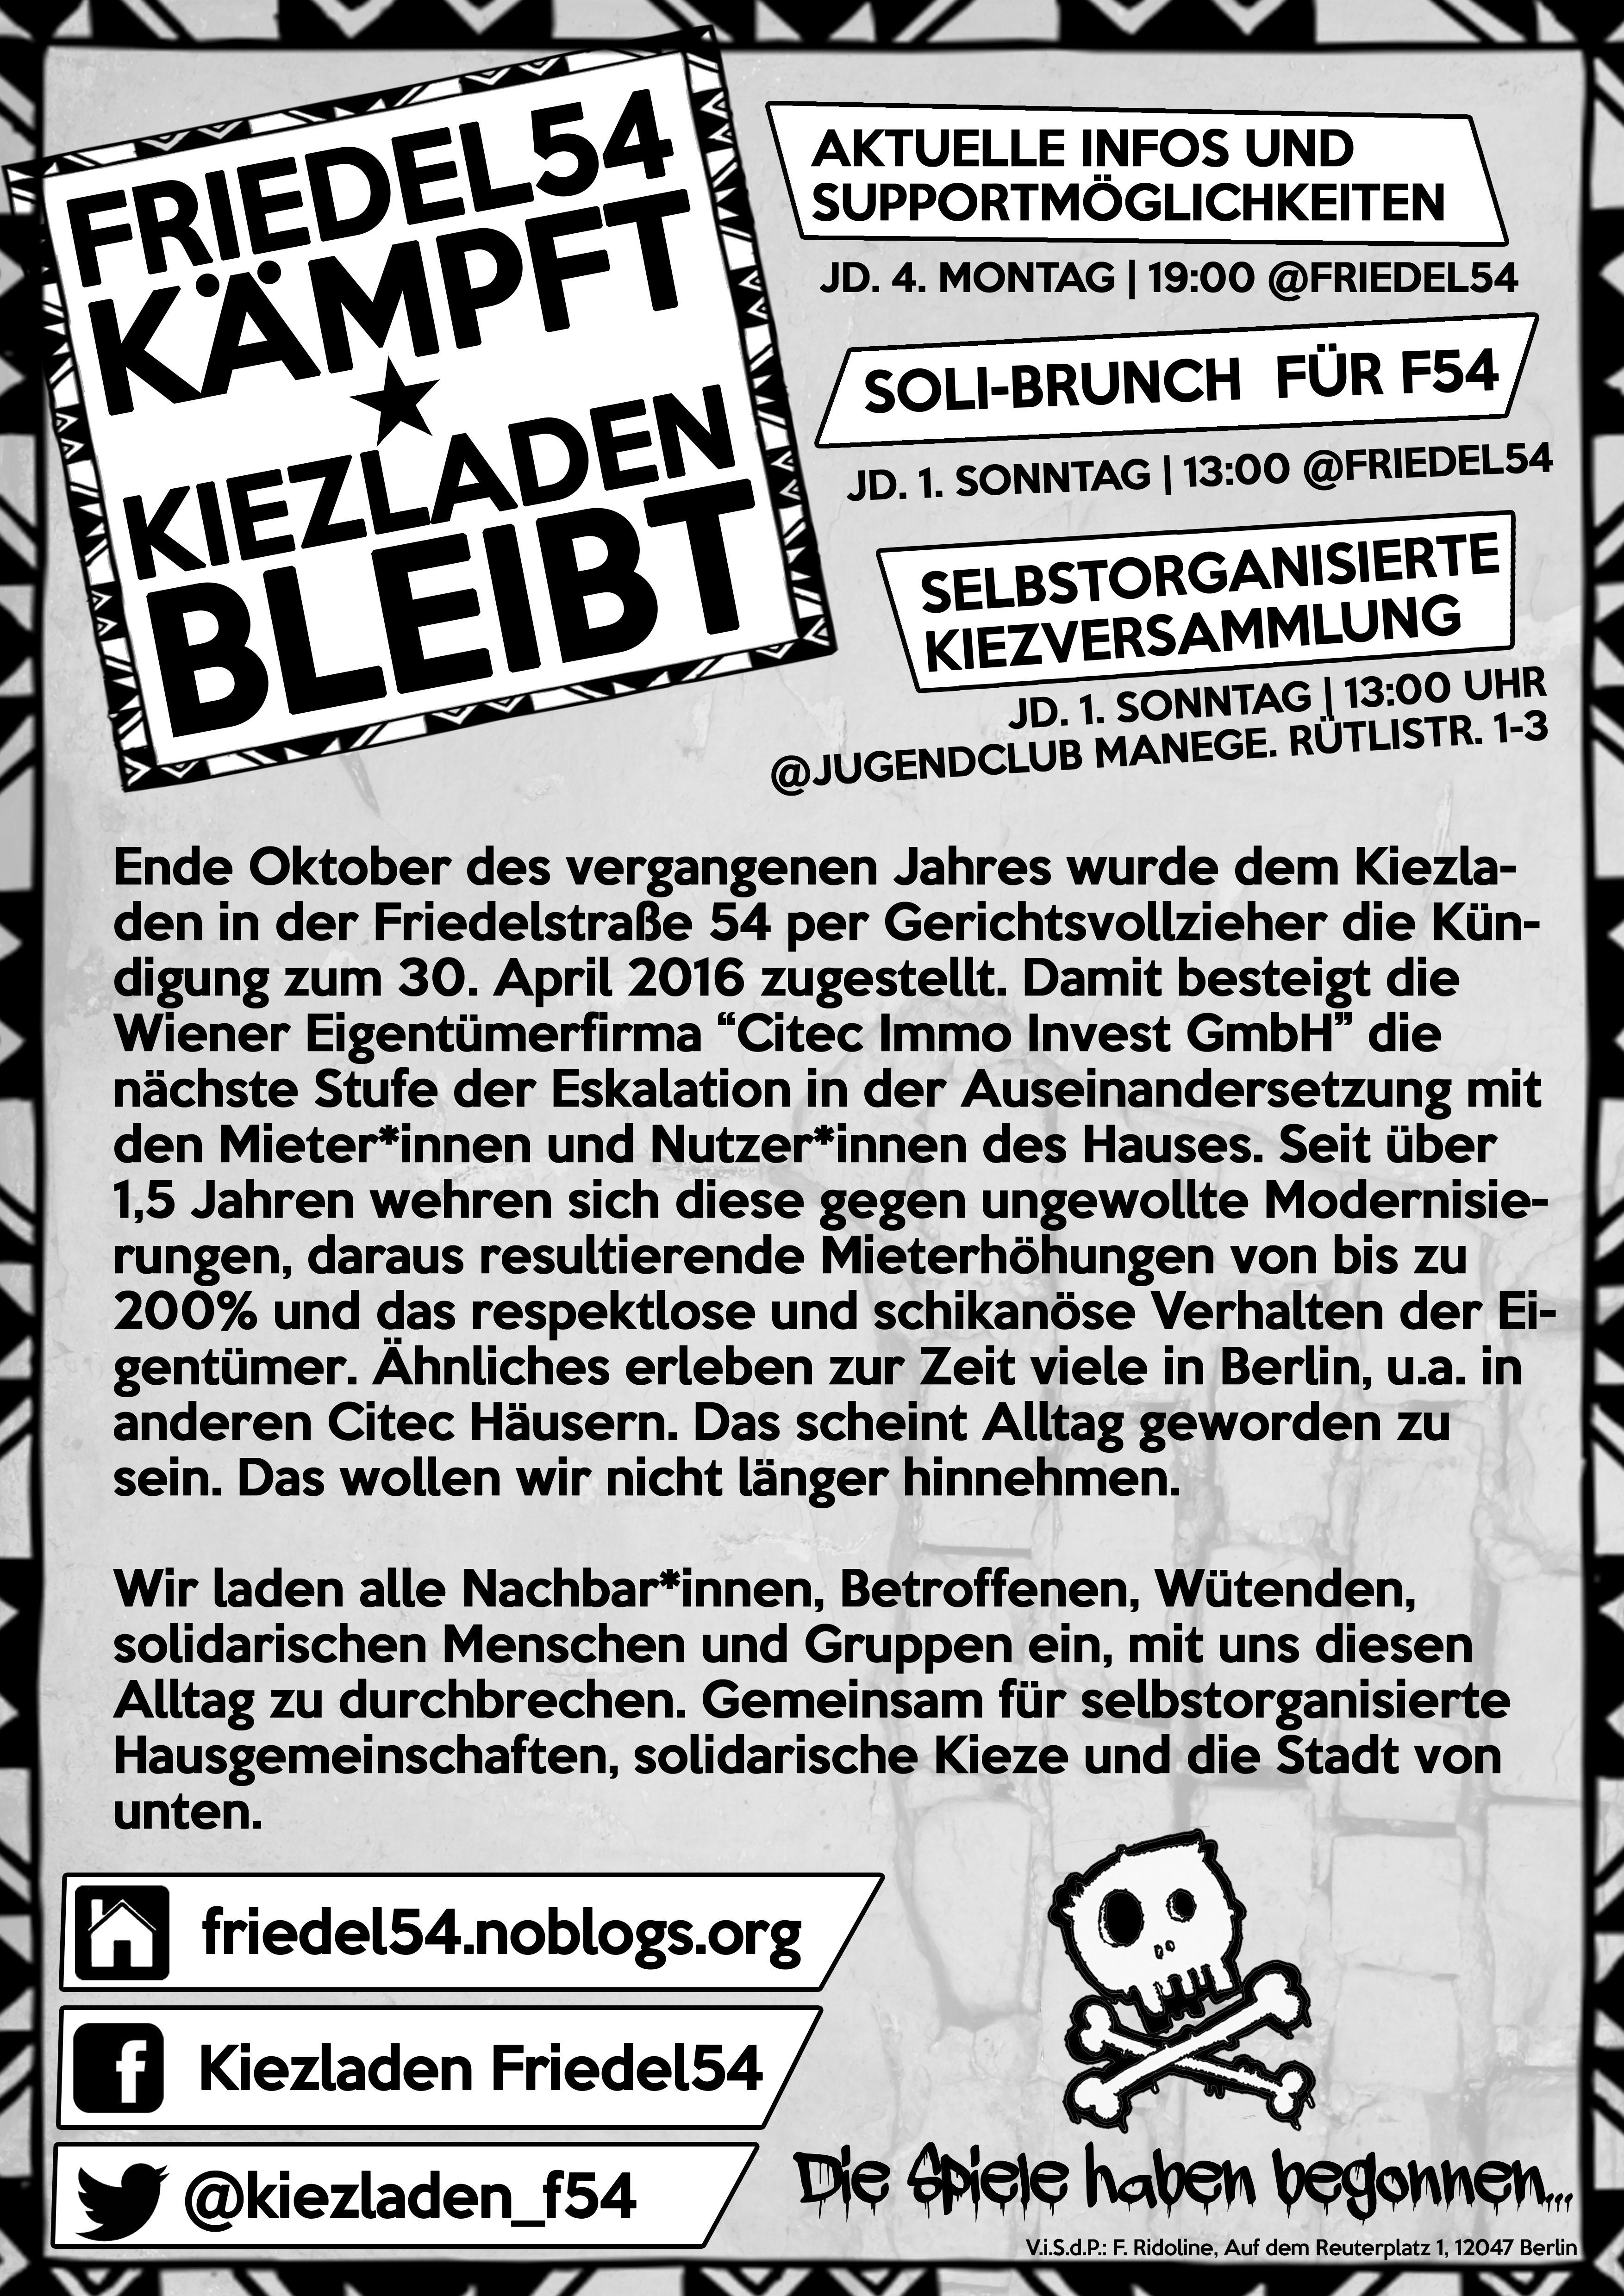 Friedel54 kämpft – Kiezladen bleibt!